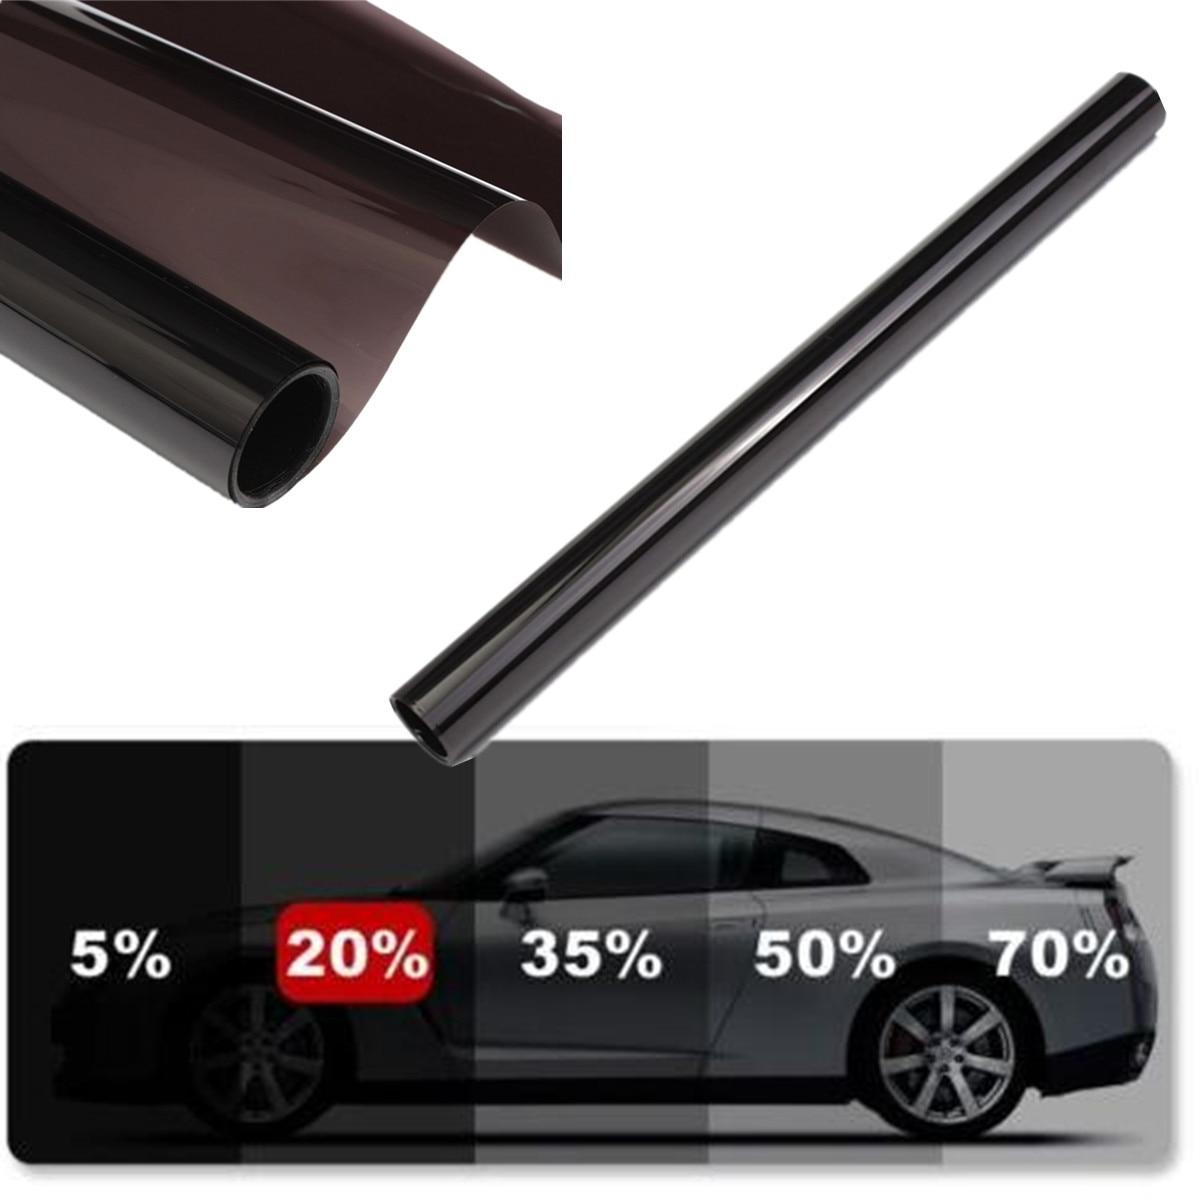 Car Window Film Tinting Glass Part Rolls Or Full 5/% 20/% 35/% VLT